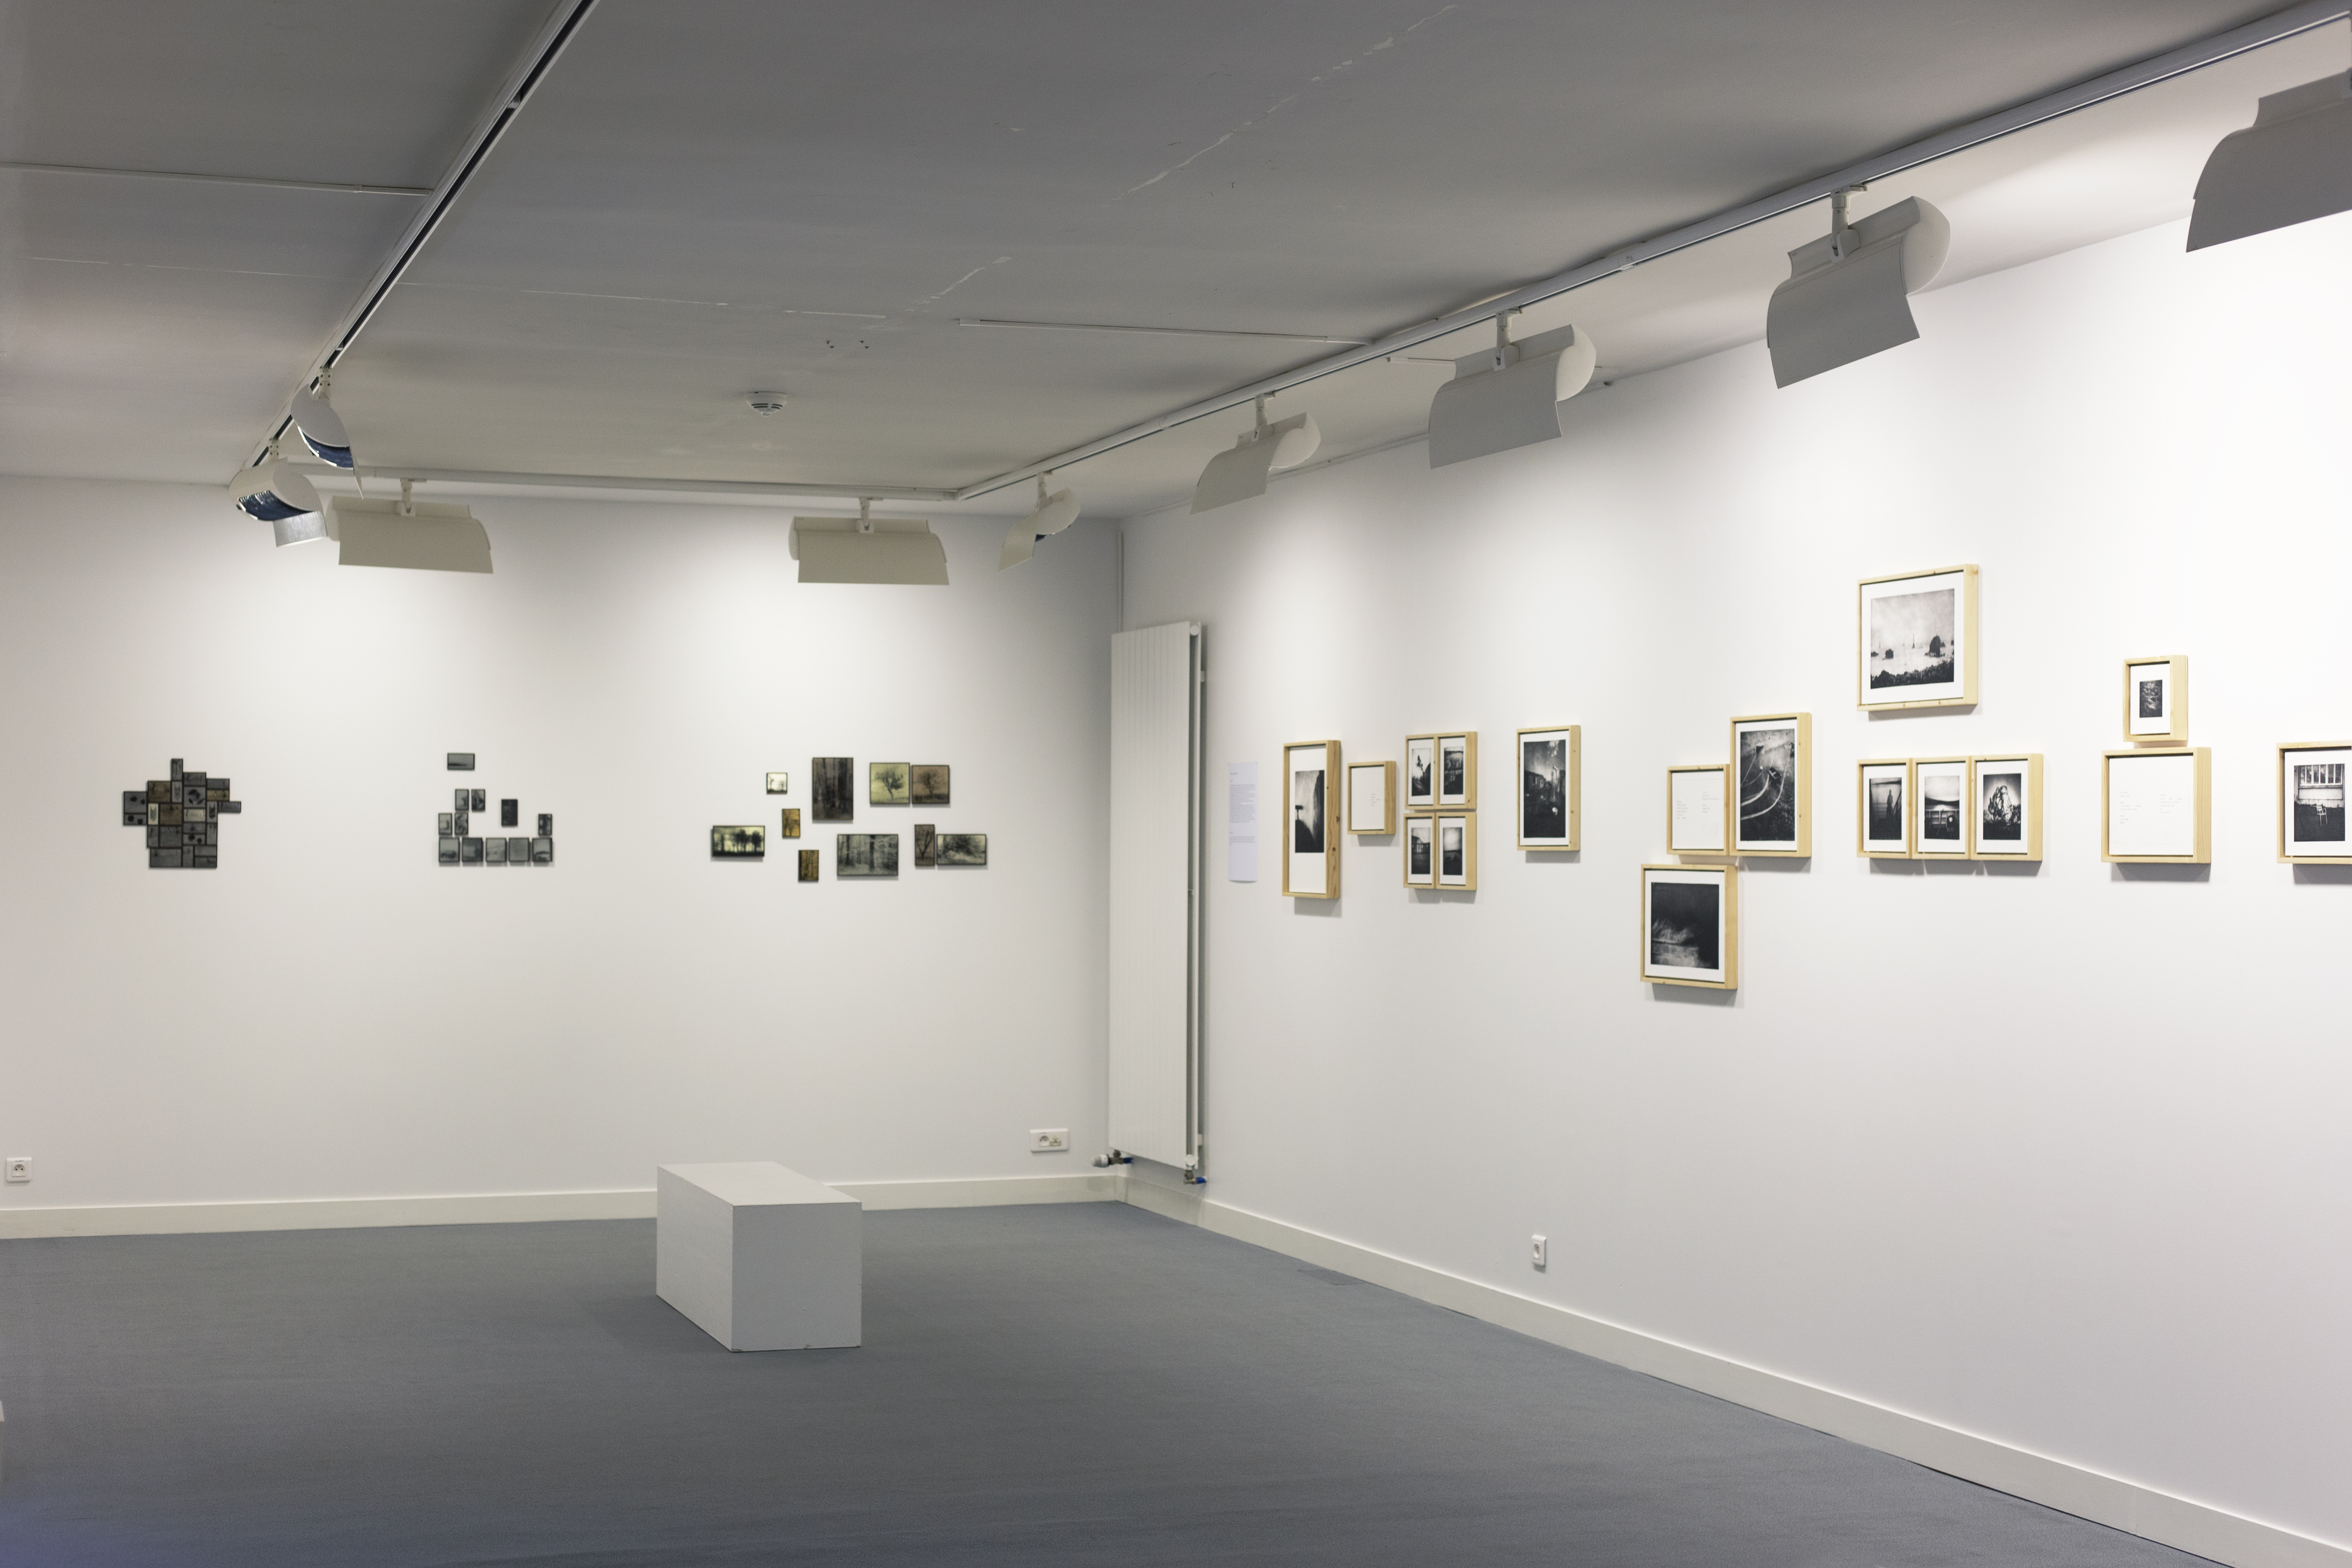 galerie expo